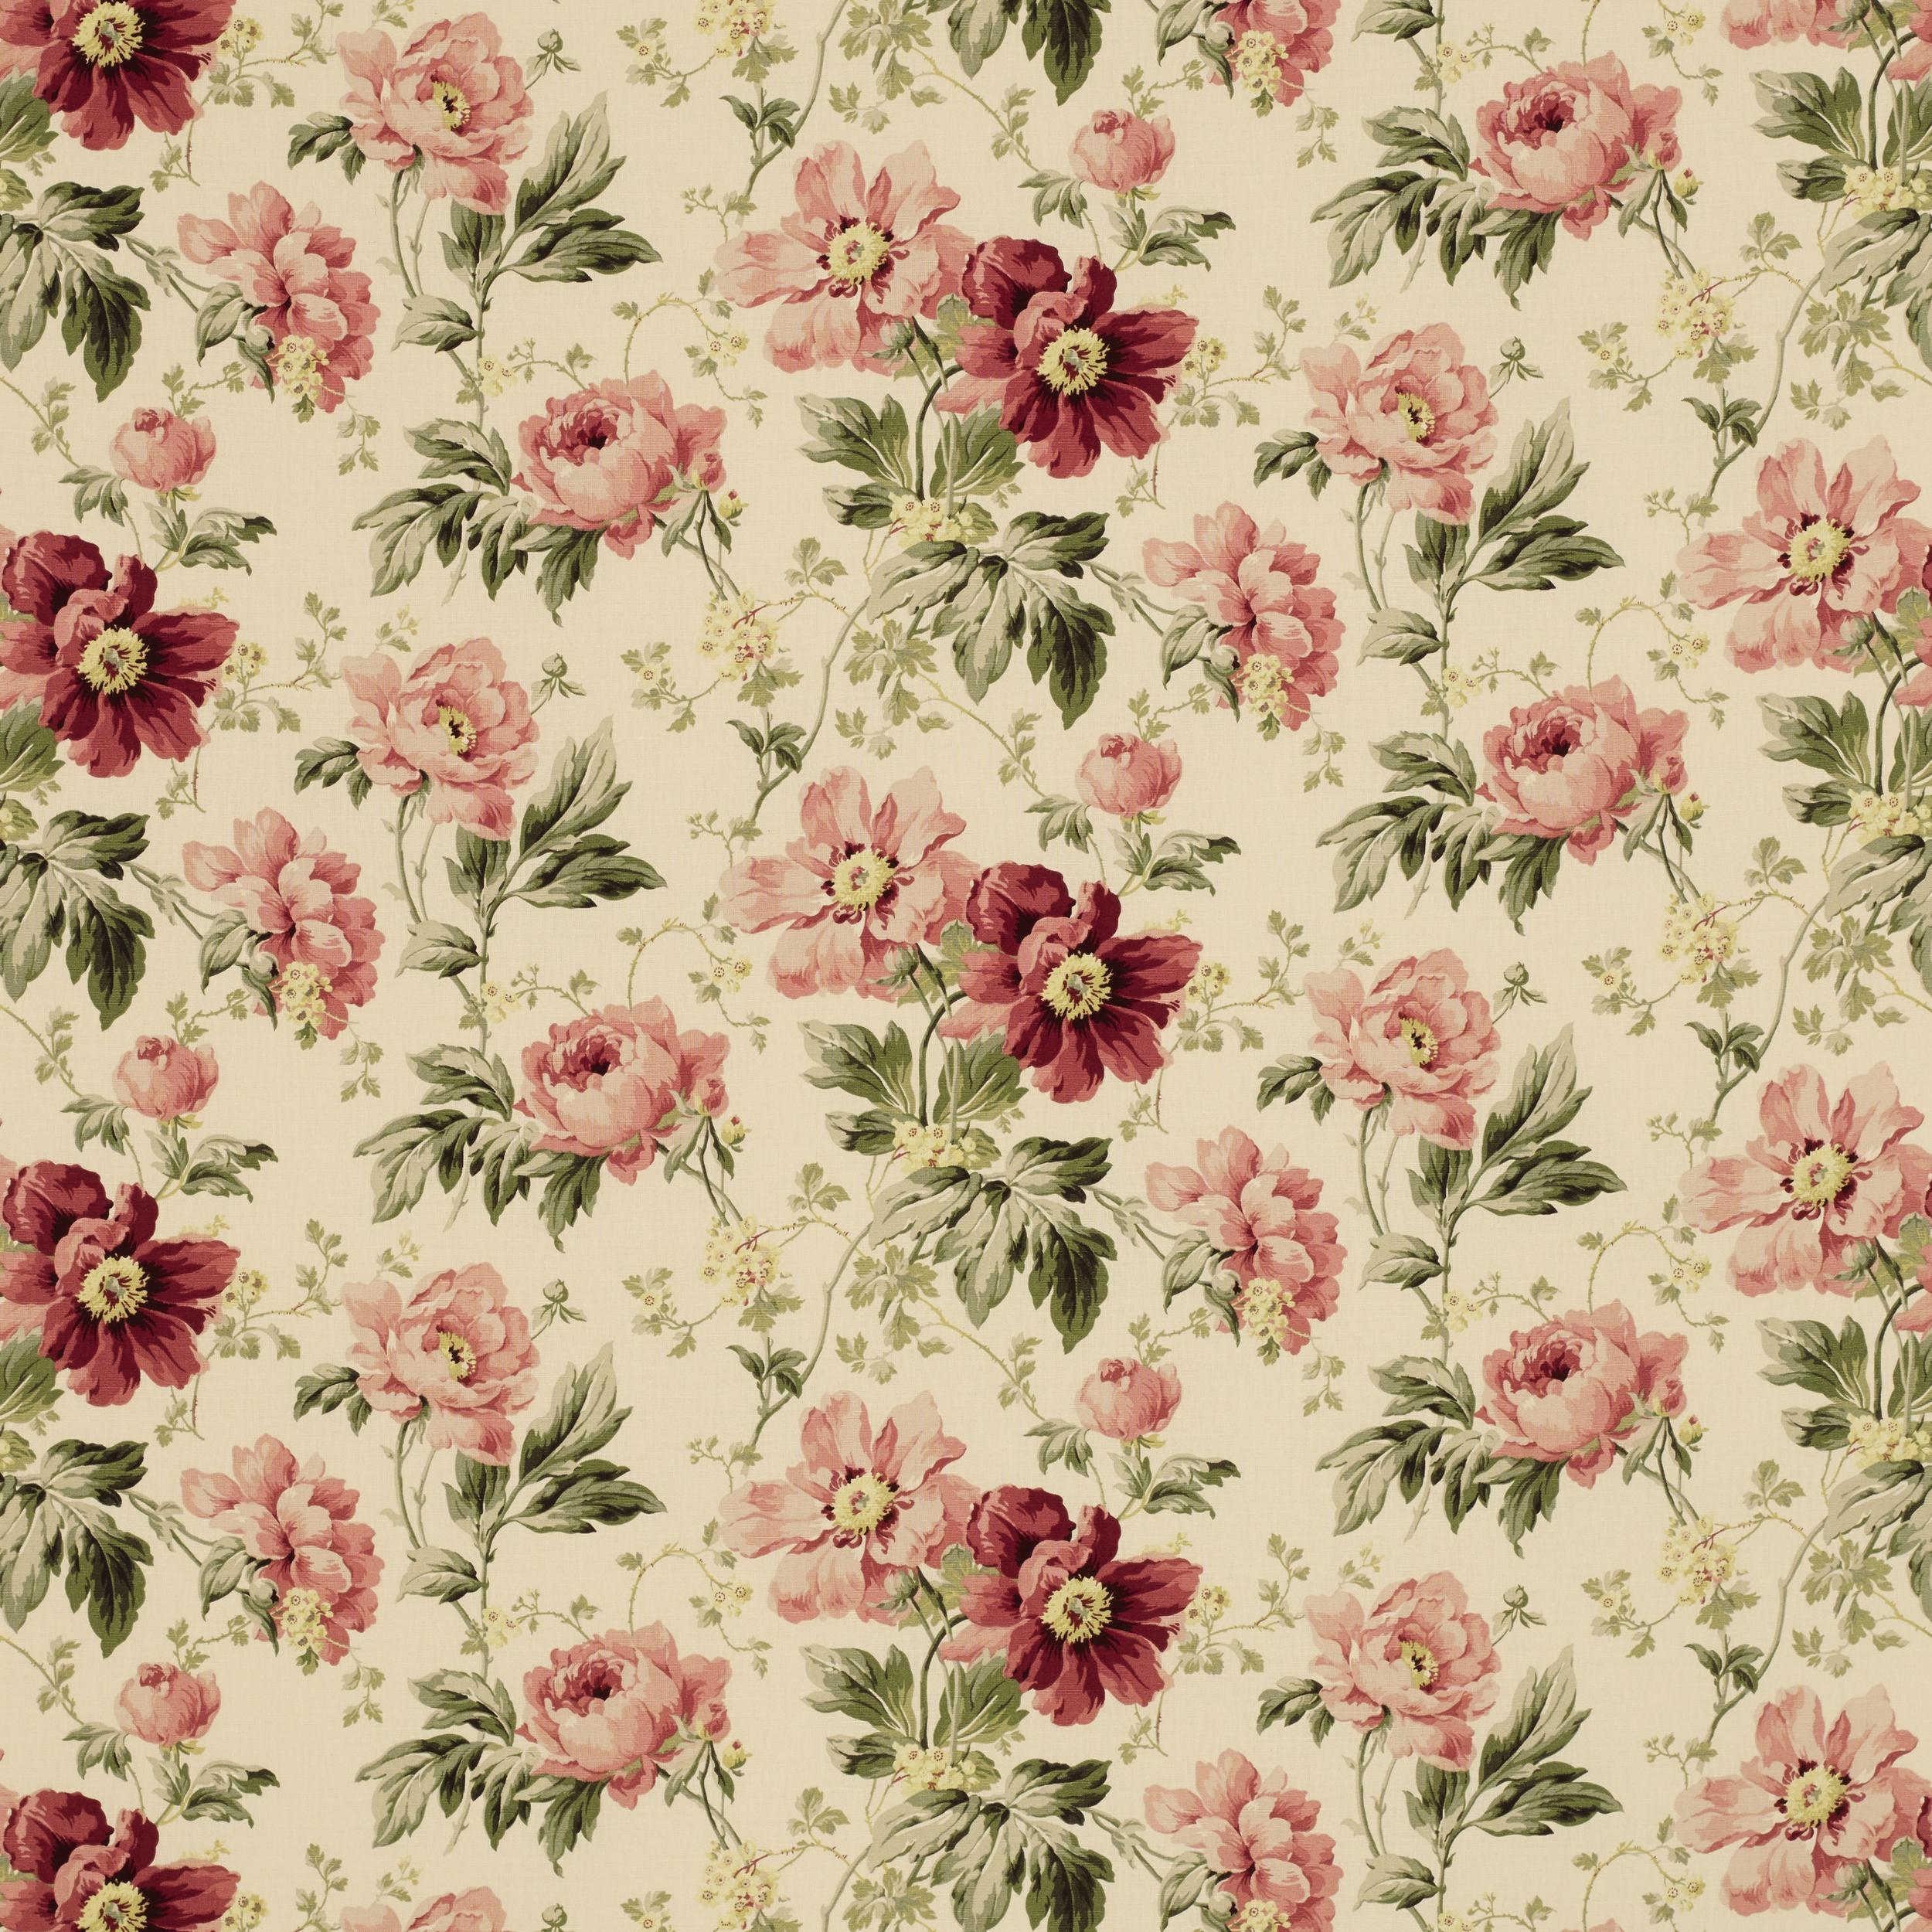 Peony Garden Cranberry Linen Mix Fabric